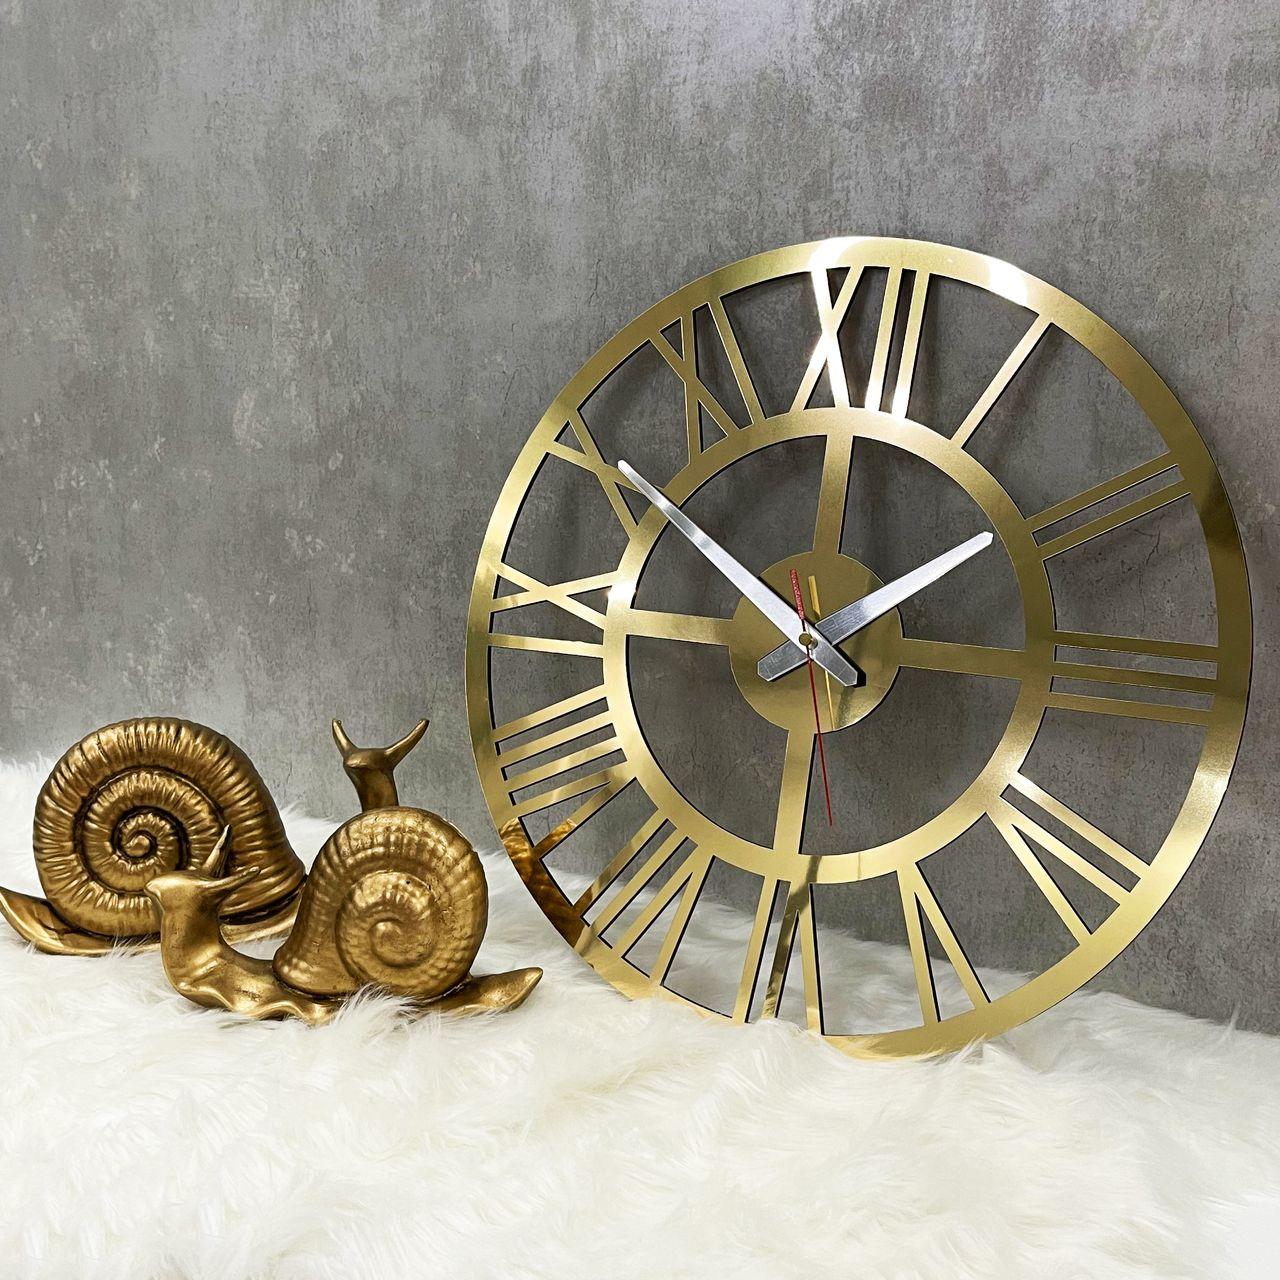 ساعت دیواری اِلِنسی مدل Apollon